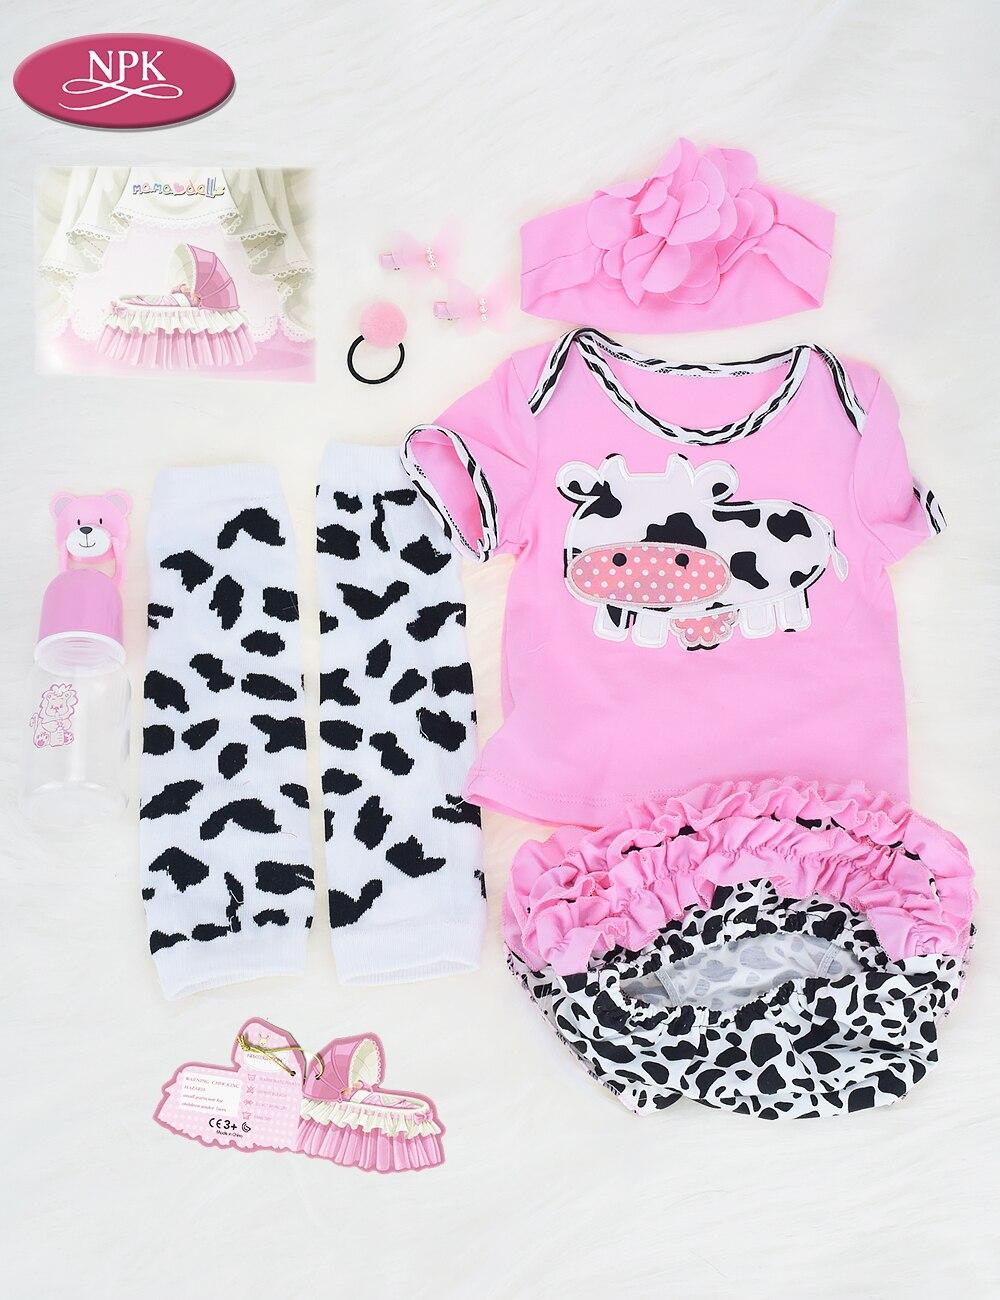 NPK Real 57CM Full Body SIlicone Girl Reborn Babies Doll Bath Toy Lifelike Newborn Princess Baby Doll Bonecas Bebe Reborn Menina (2)